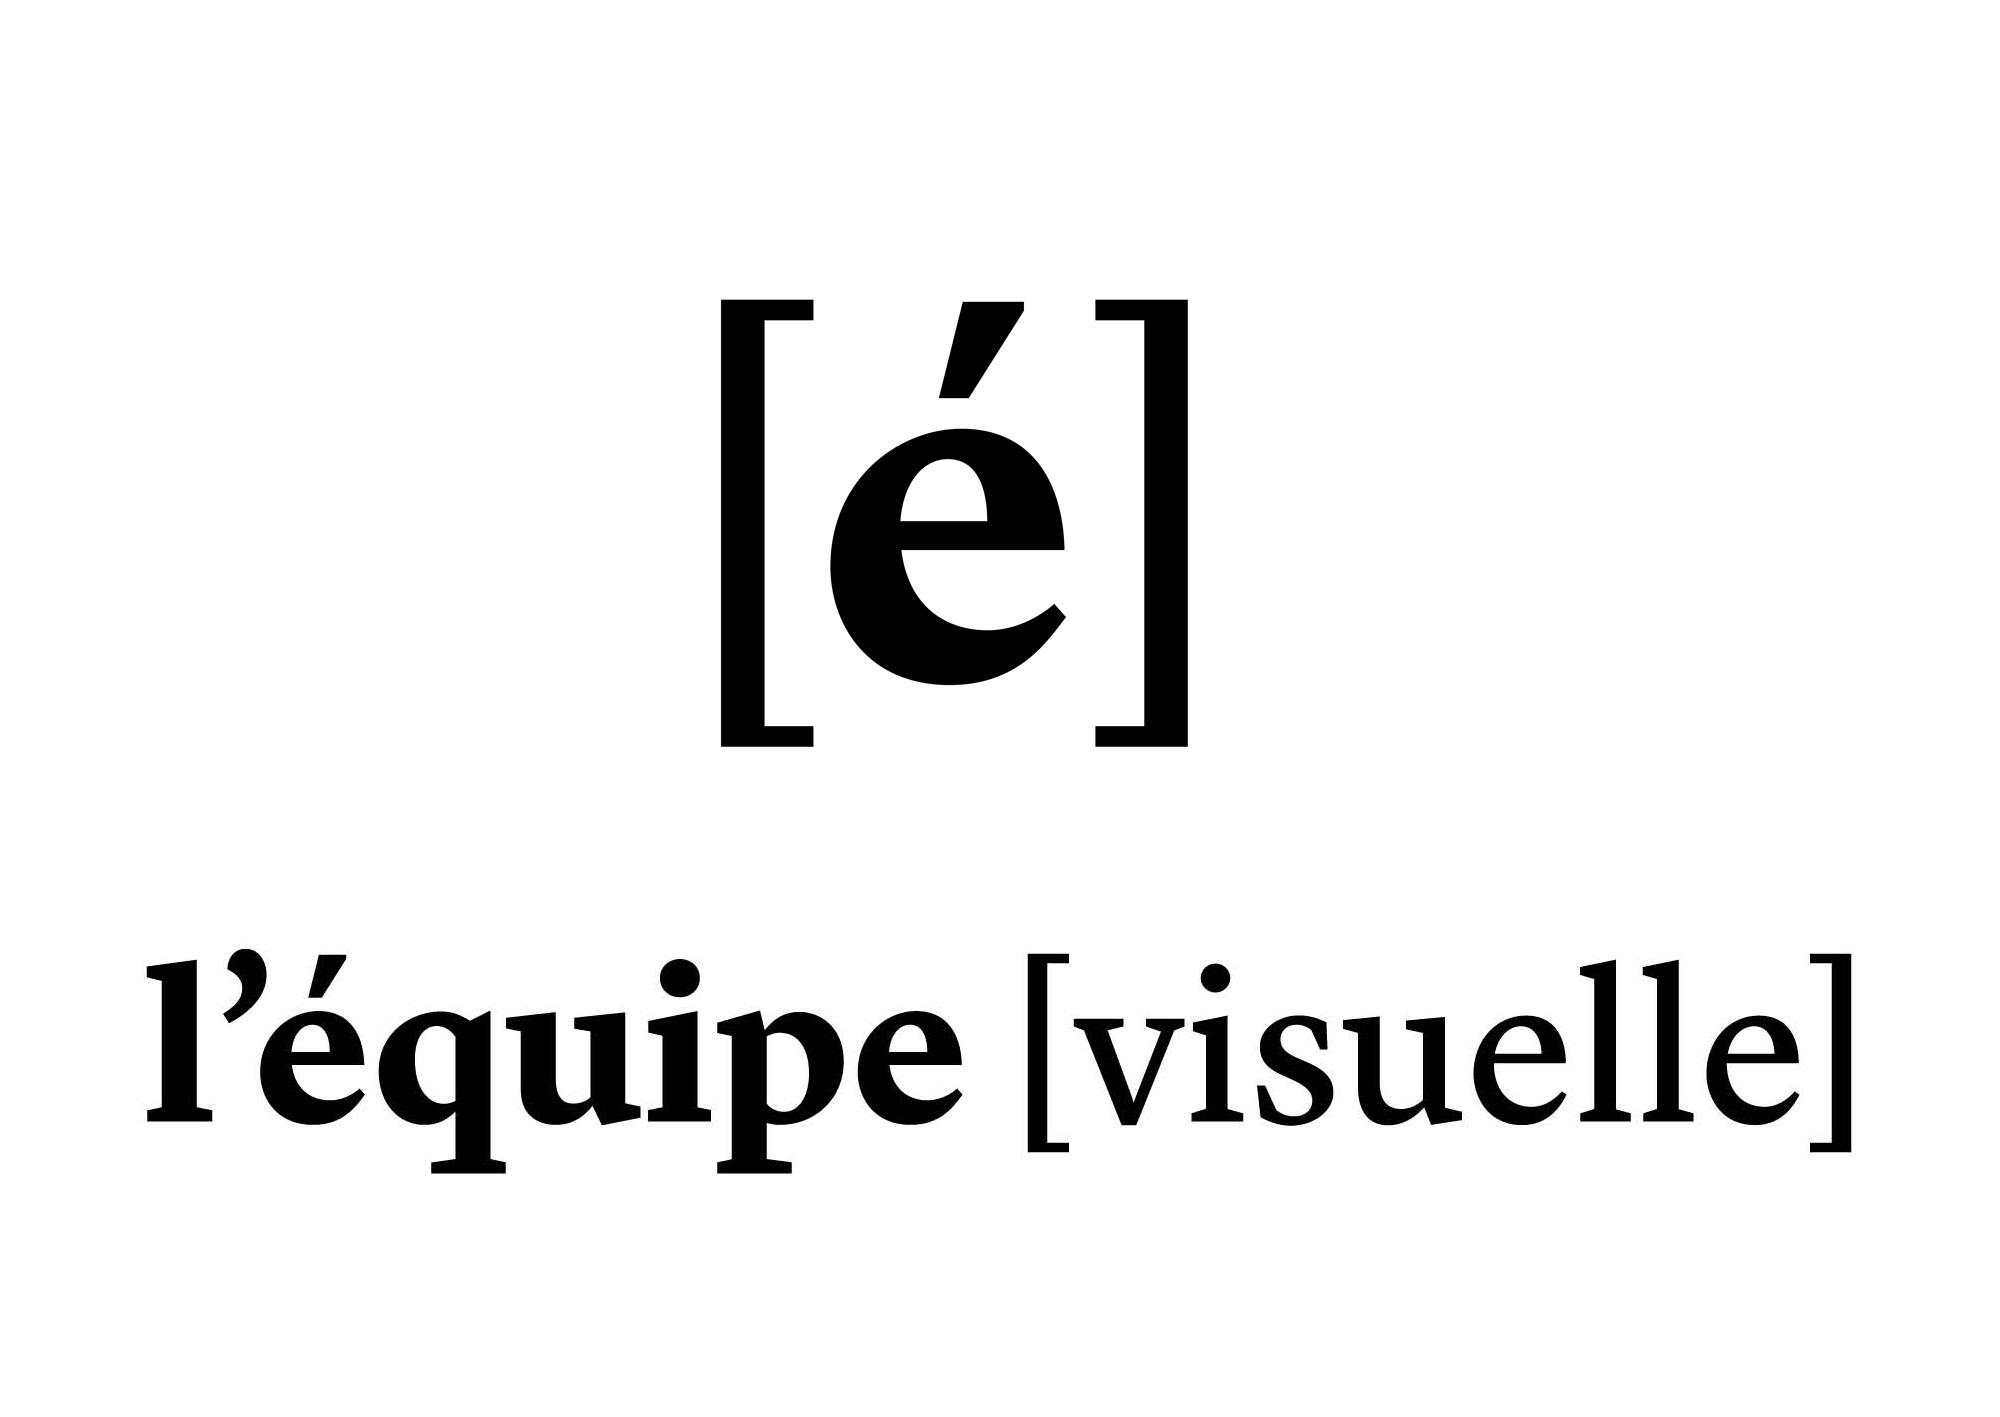 equipe-visuelle-Logo Kopie.jpg